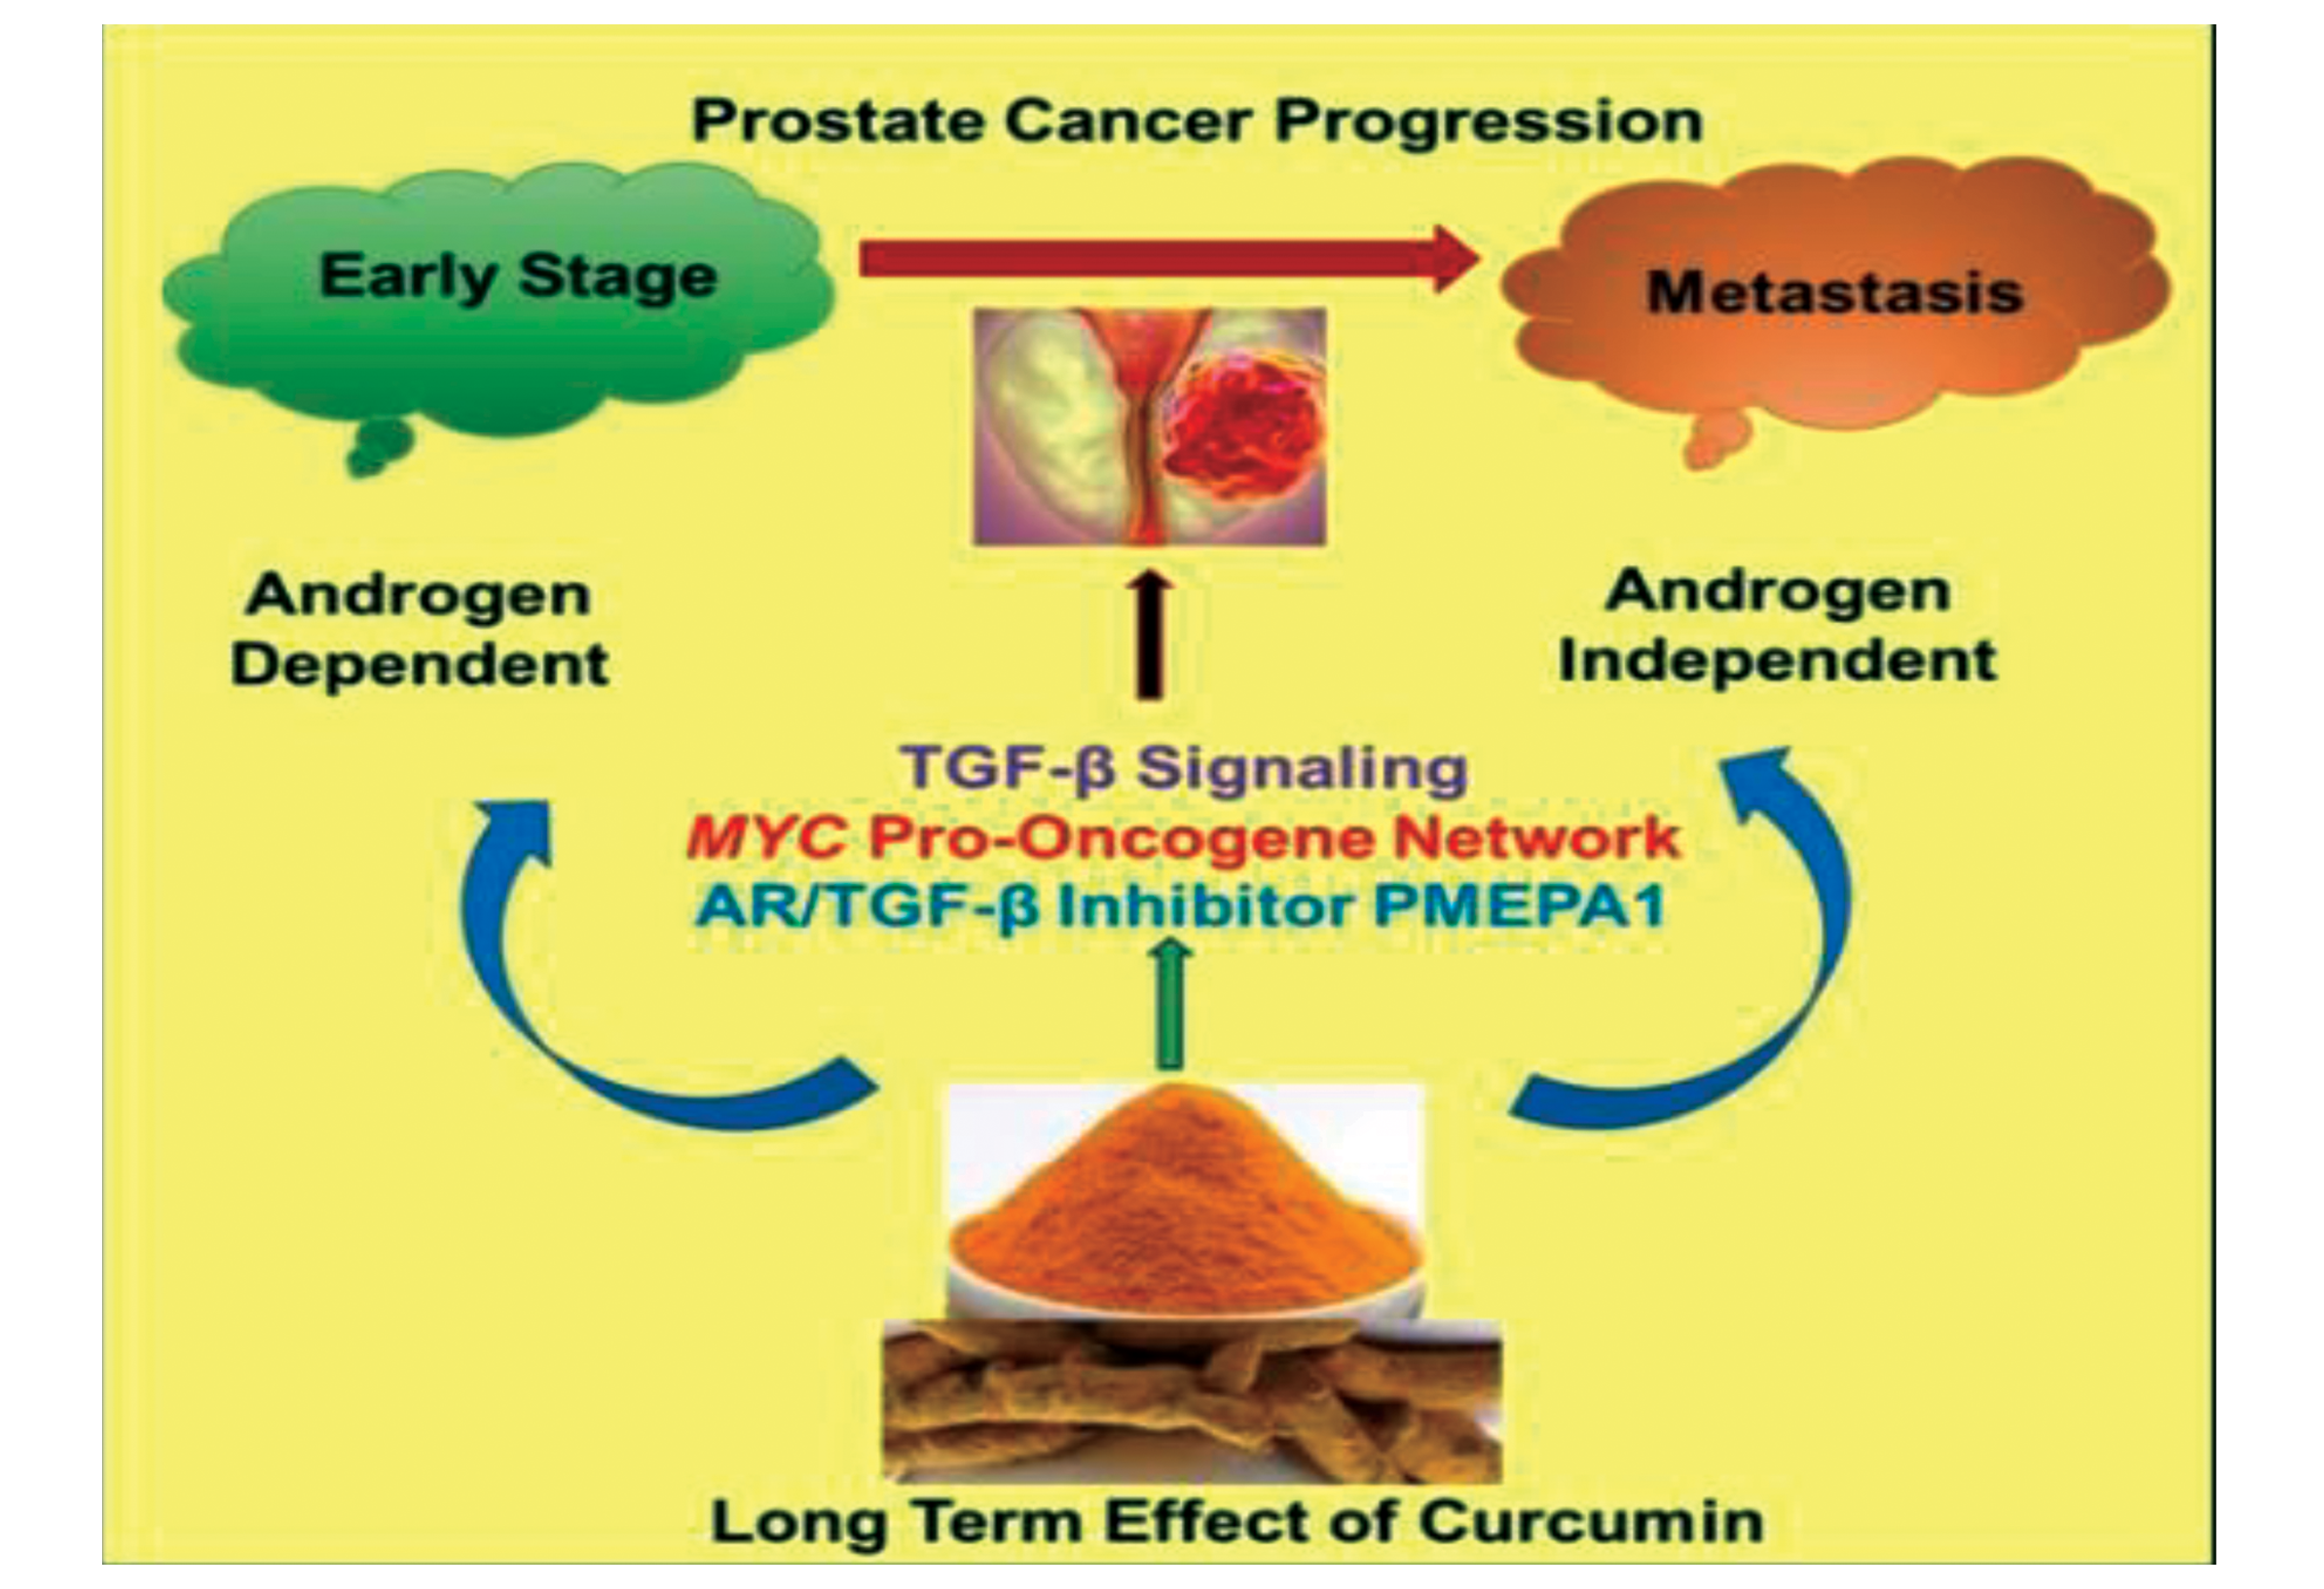 Prostate Cancer Progression